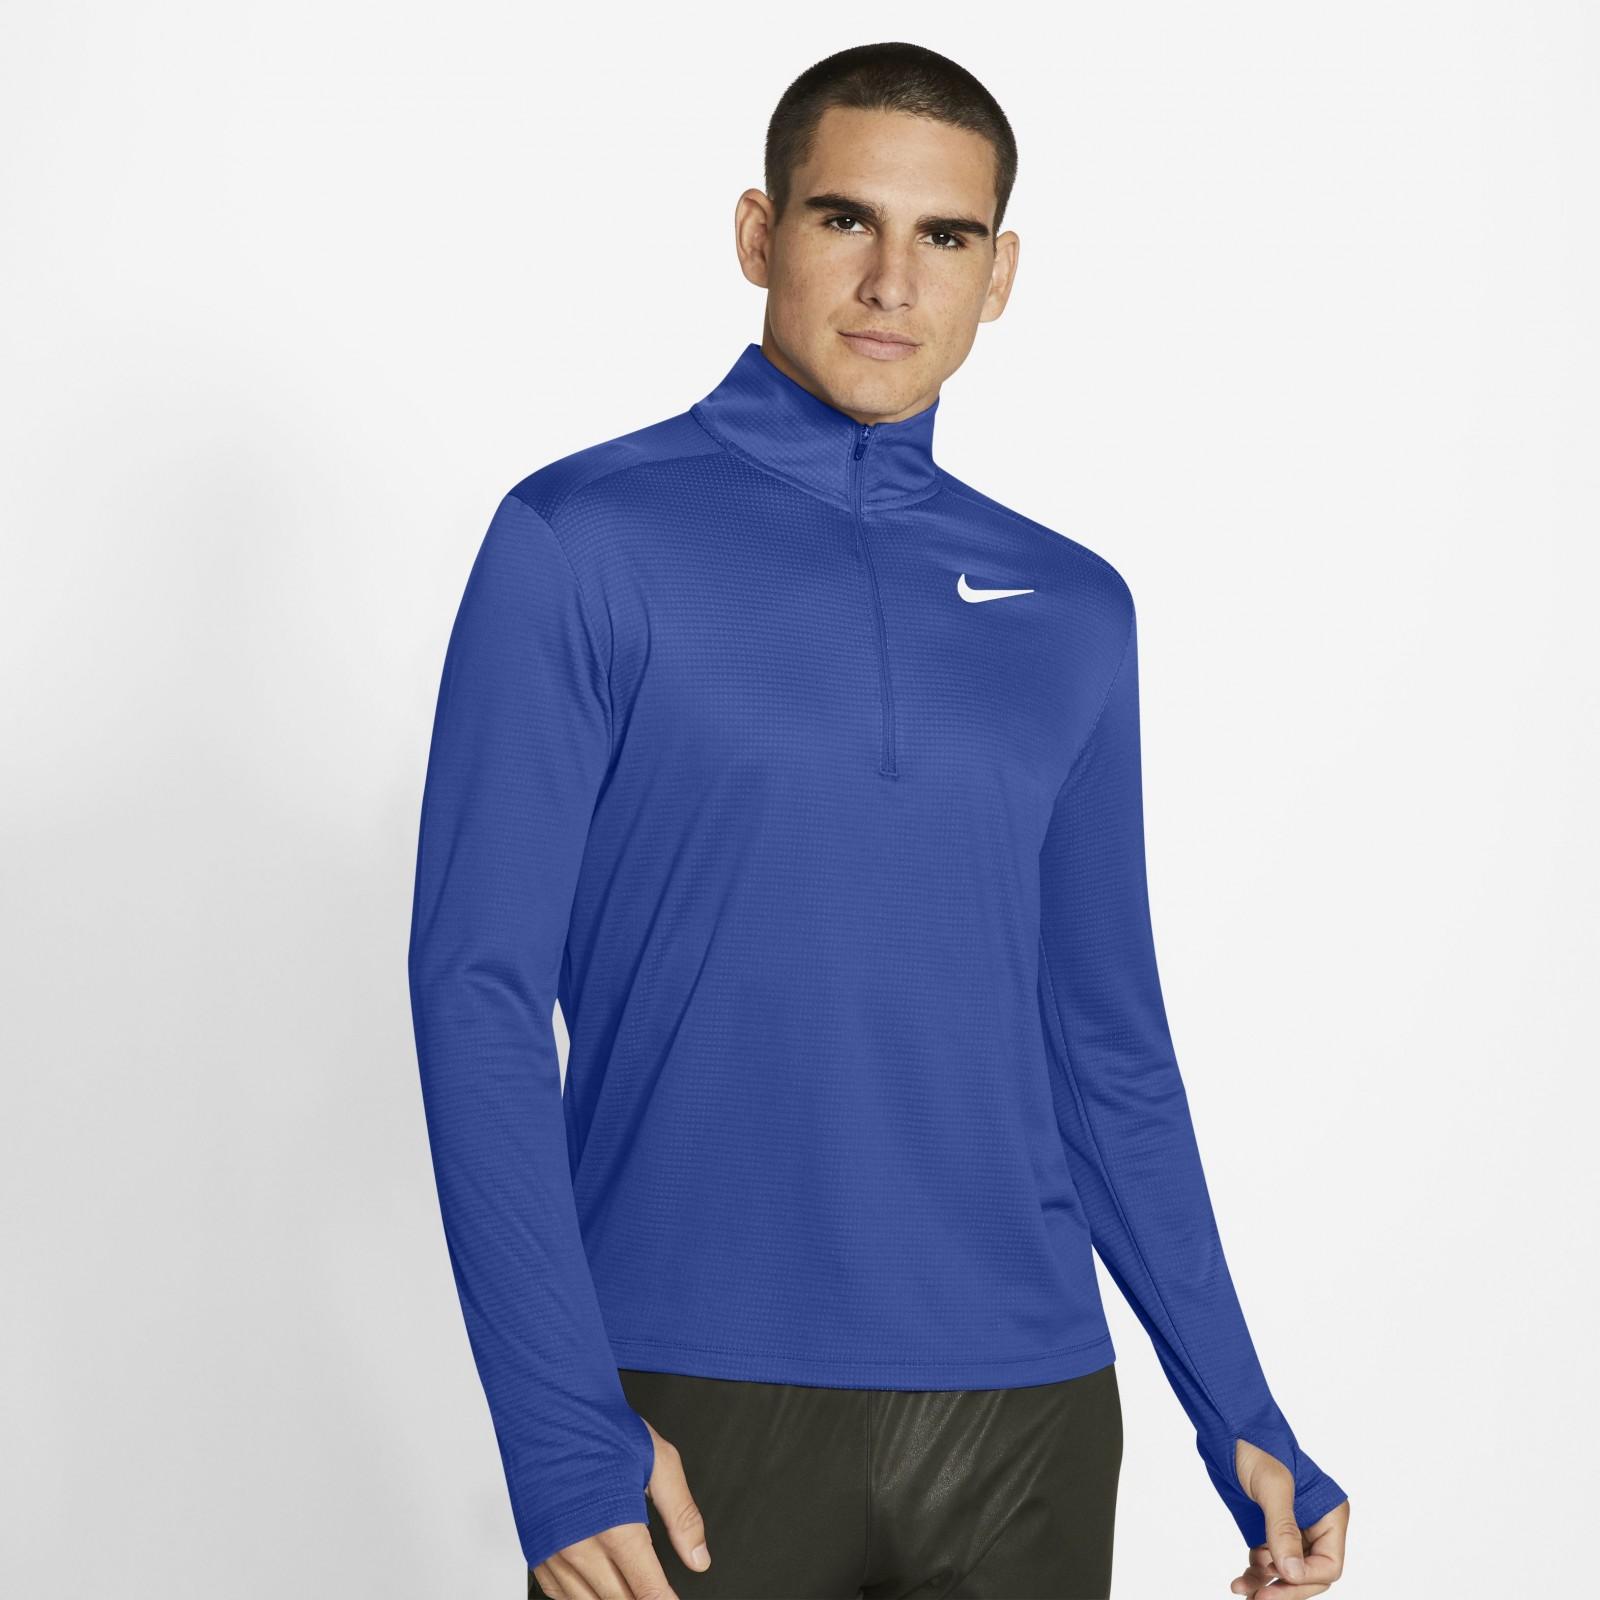 Nike Pacer GAME ROYAL/LT SMOKE GREY/REFLECTIVE SILV